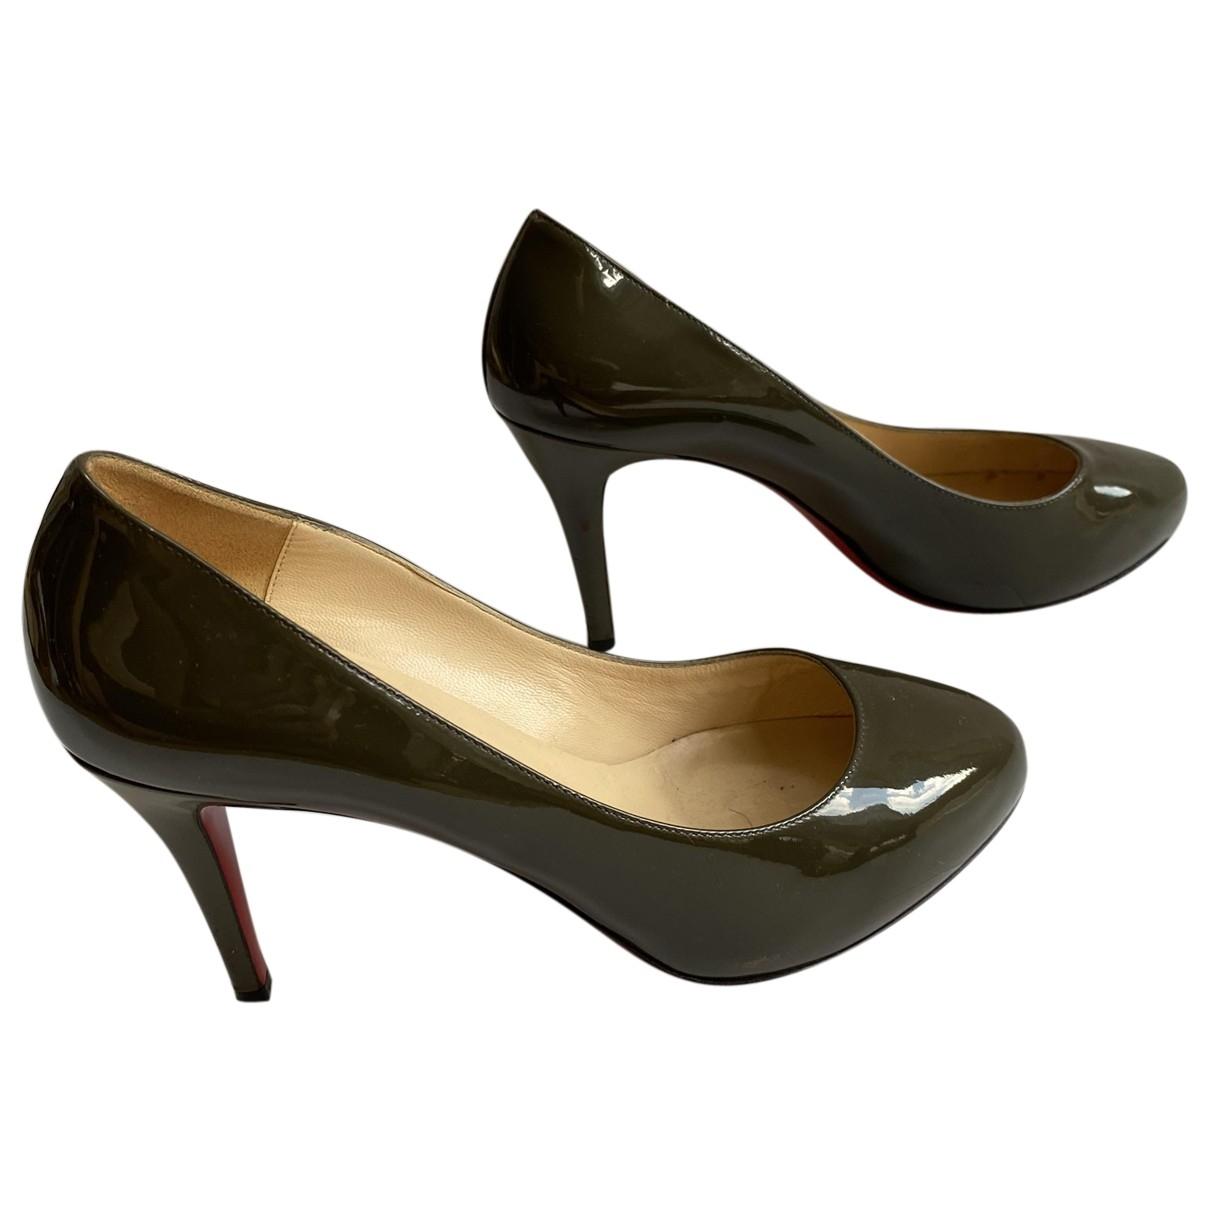 Christian Louboutin \N Khaki Patent leather Heels for Women 37 EU